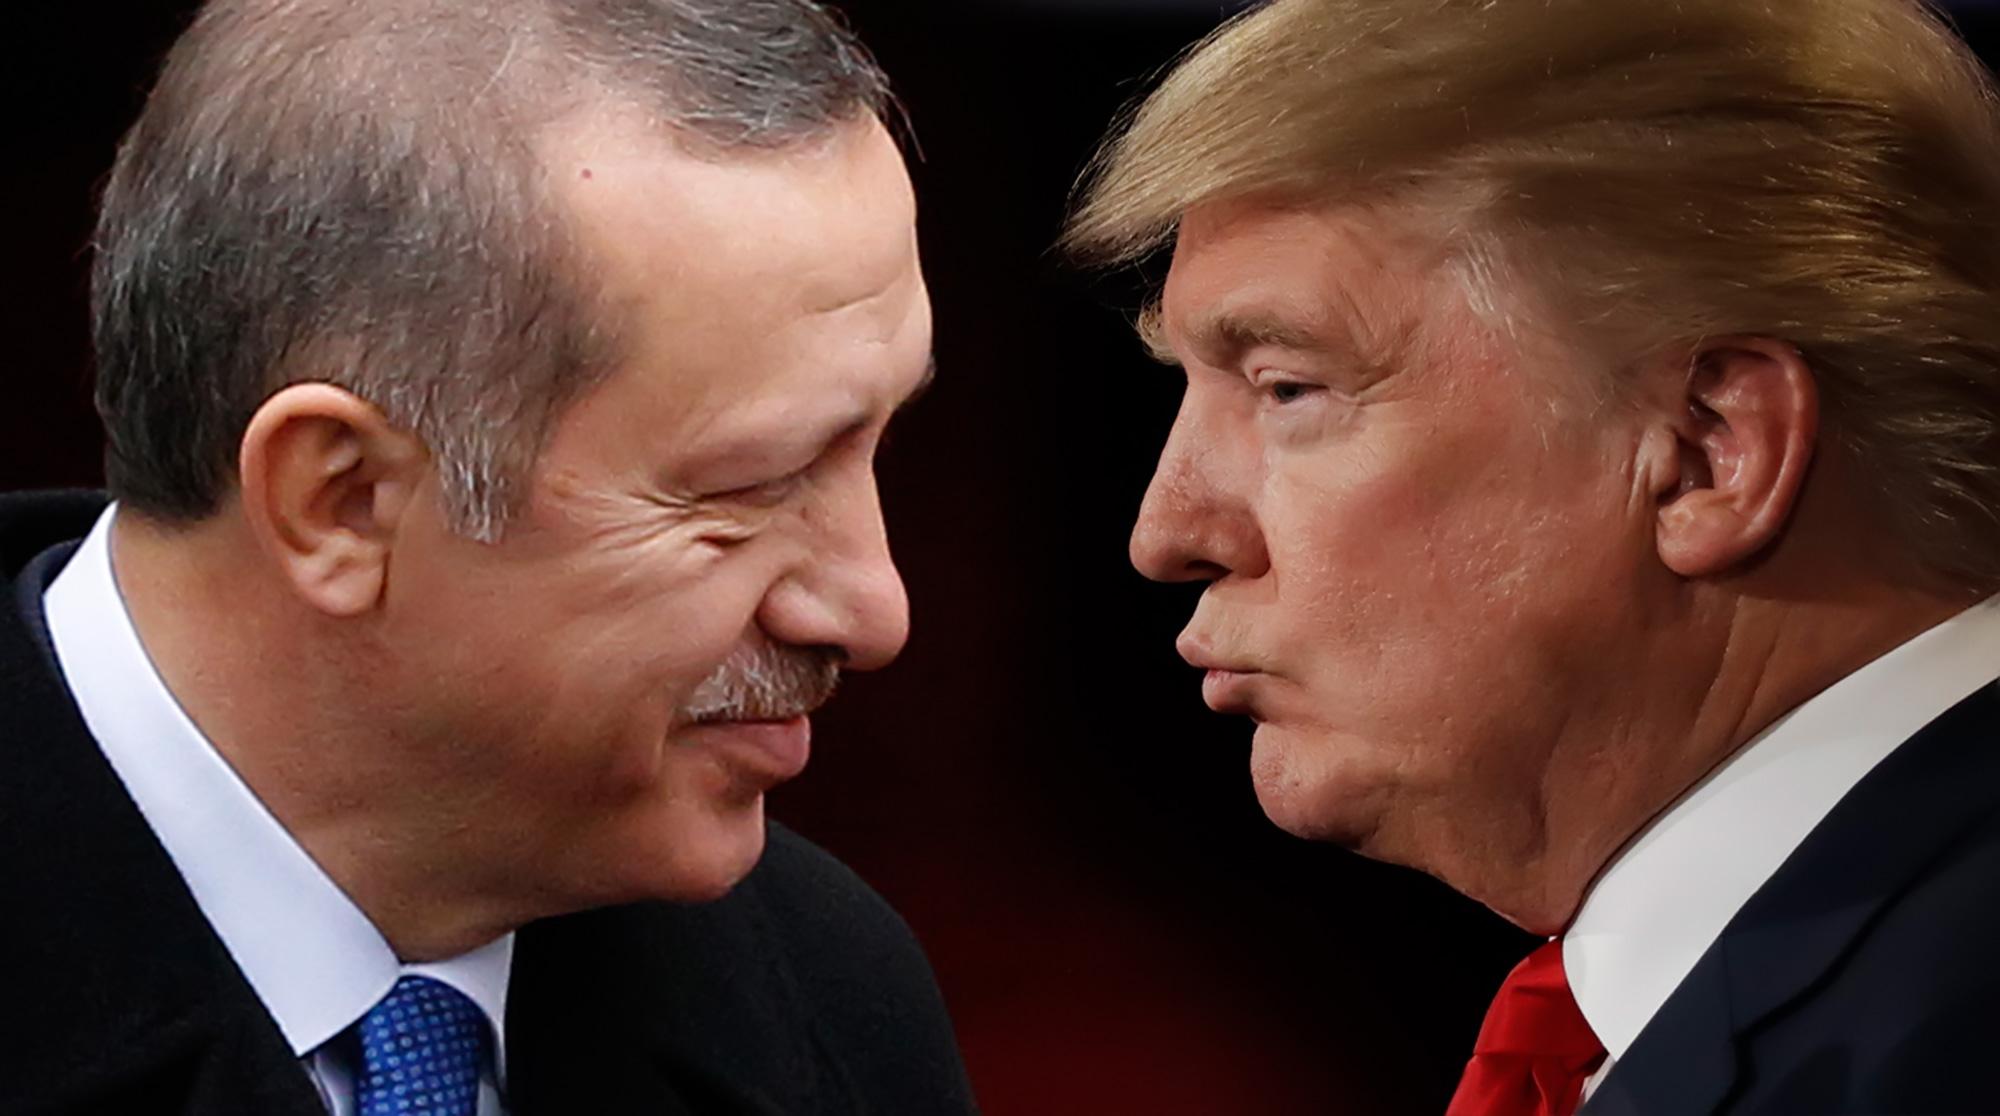 Headscarf rights in Turkey